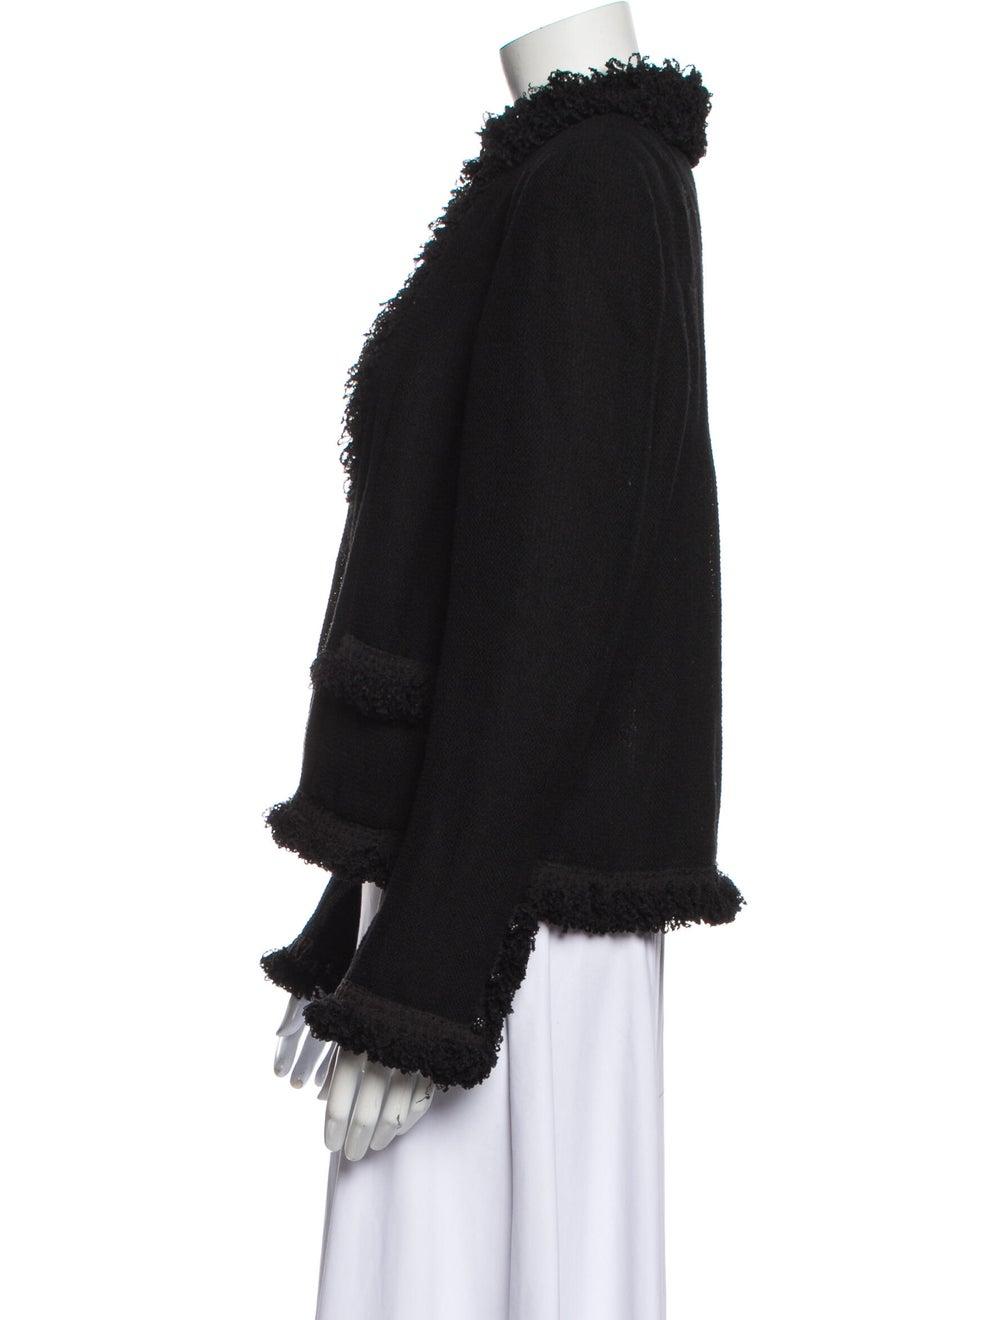 Chanel Vintage 2003 Evening Jacket Wool - image 2